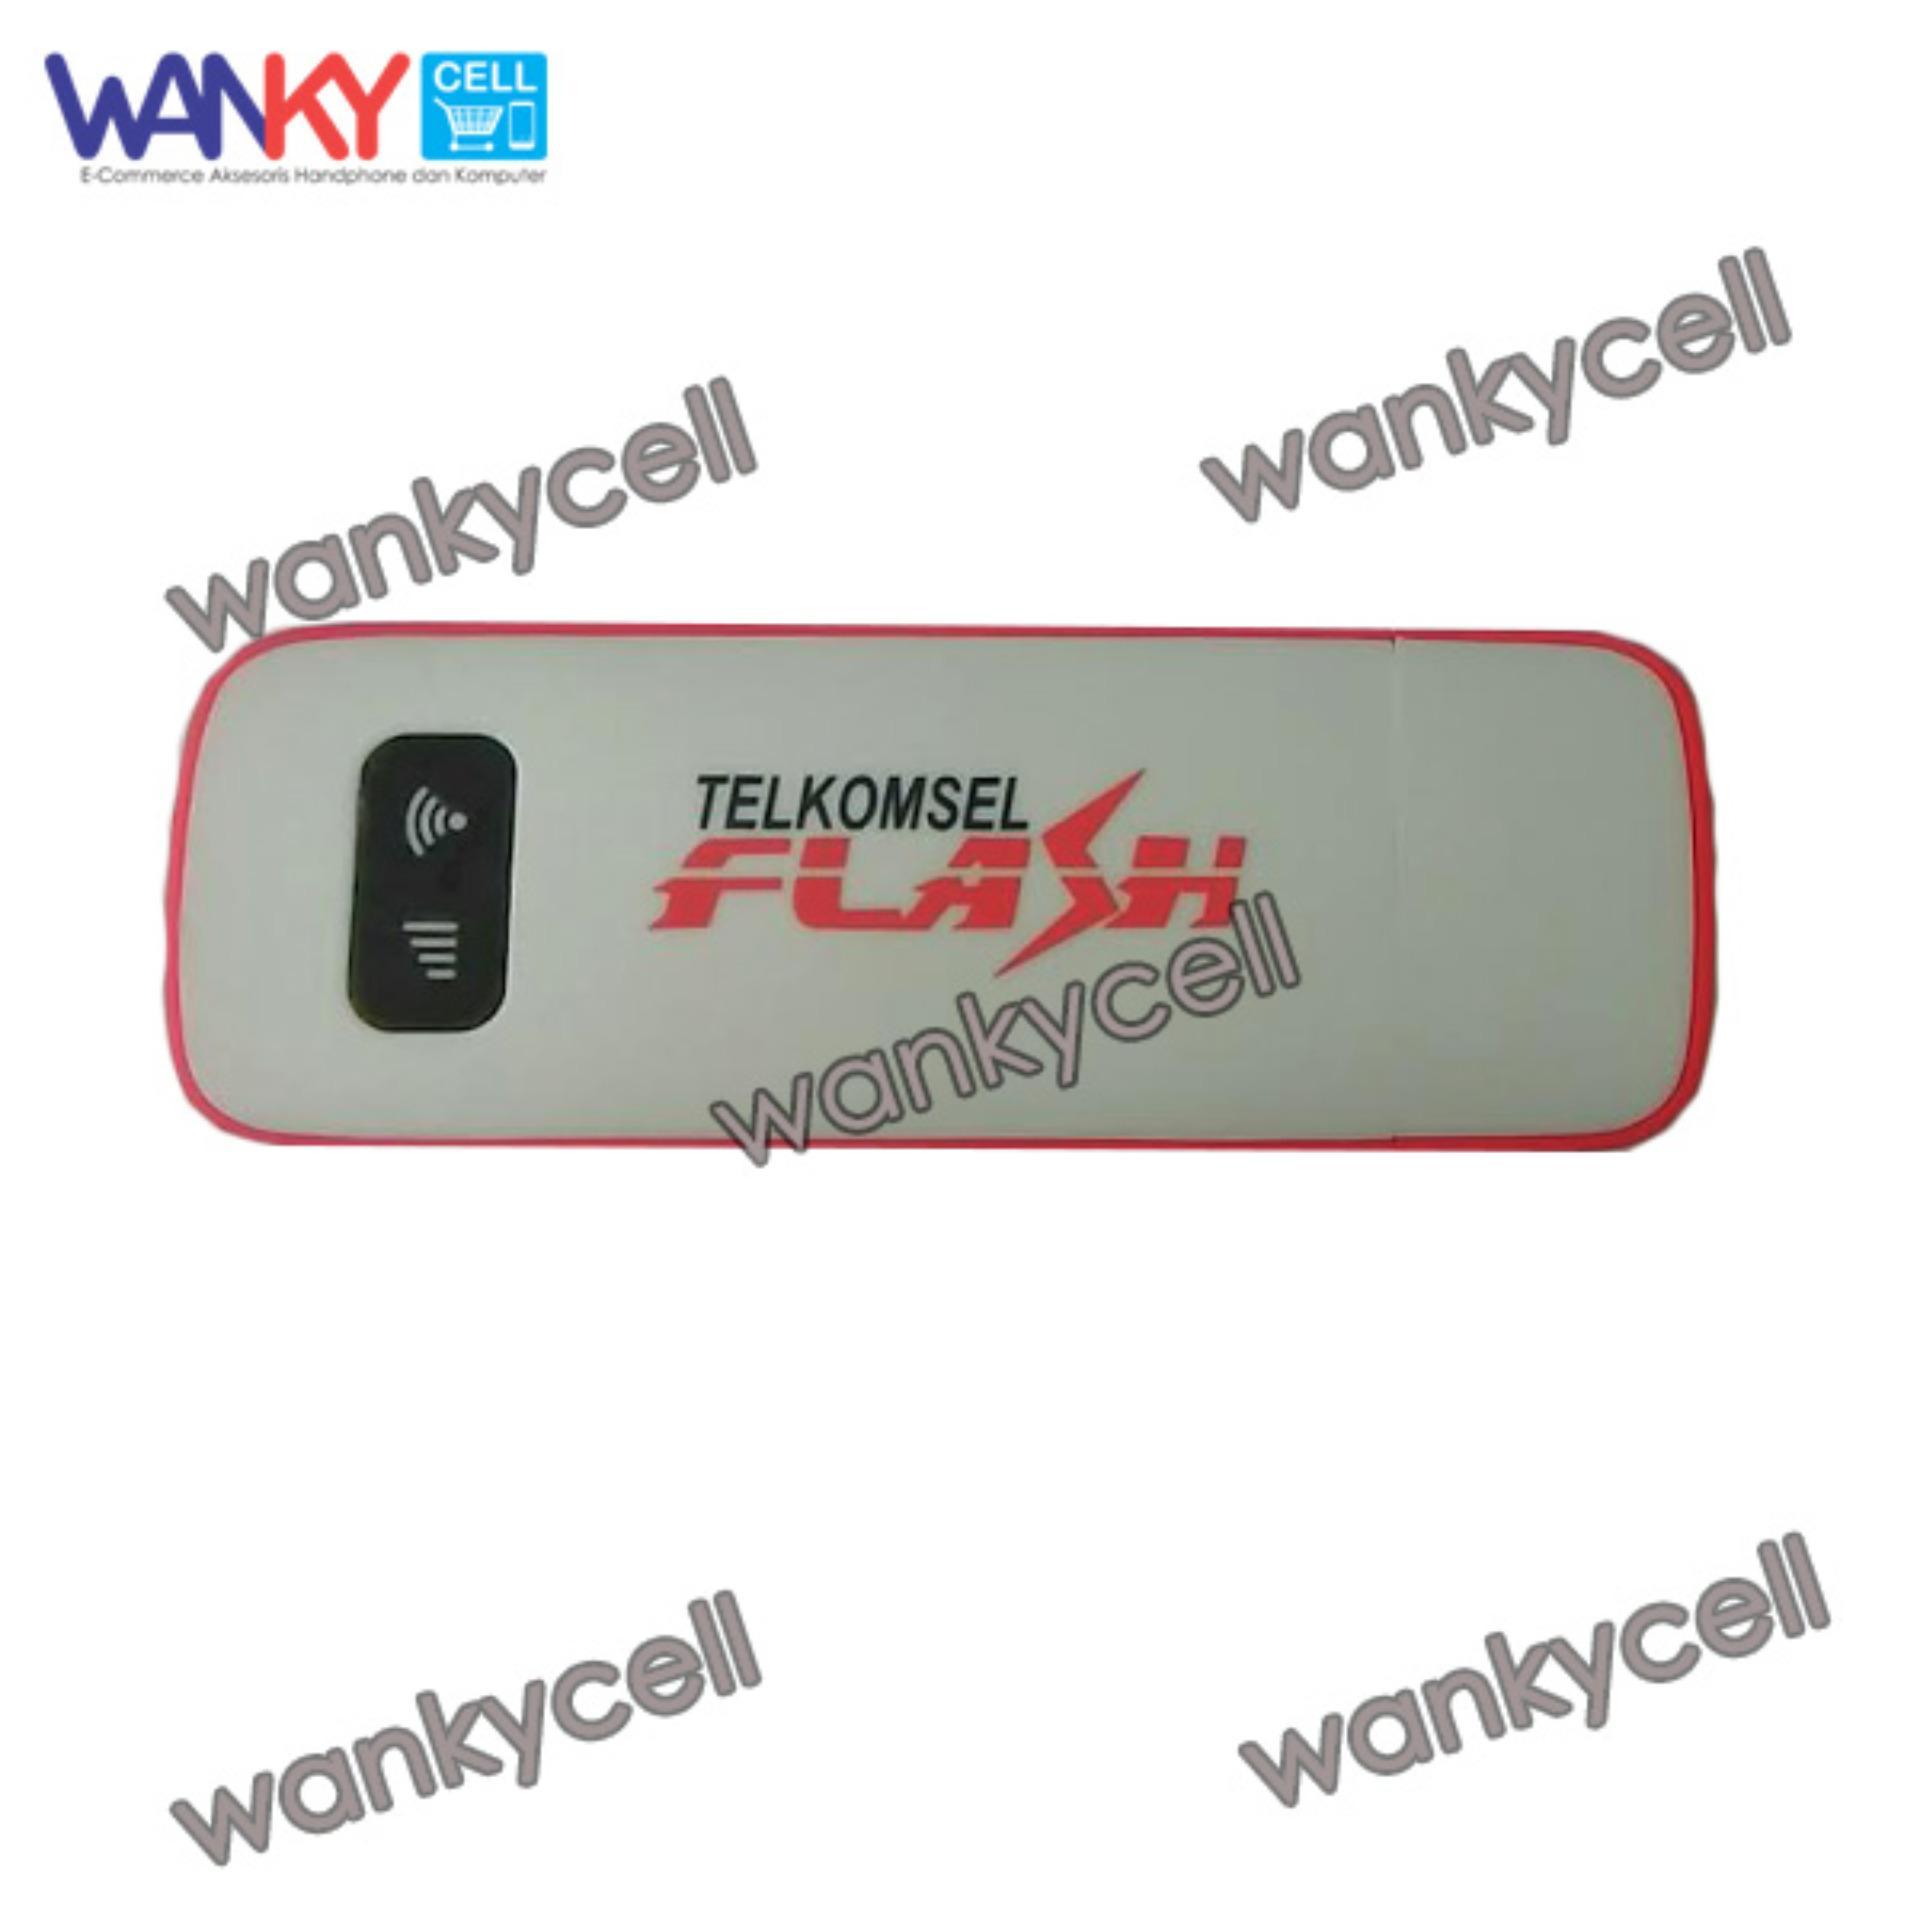 Telkomsel Flash USB Mobile Link Wingle ML27 4G LTE 150Mbps Wifi Hotspot